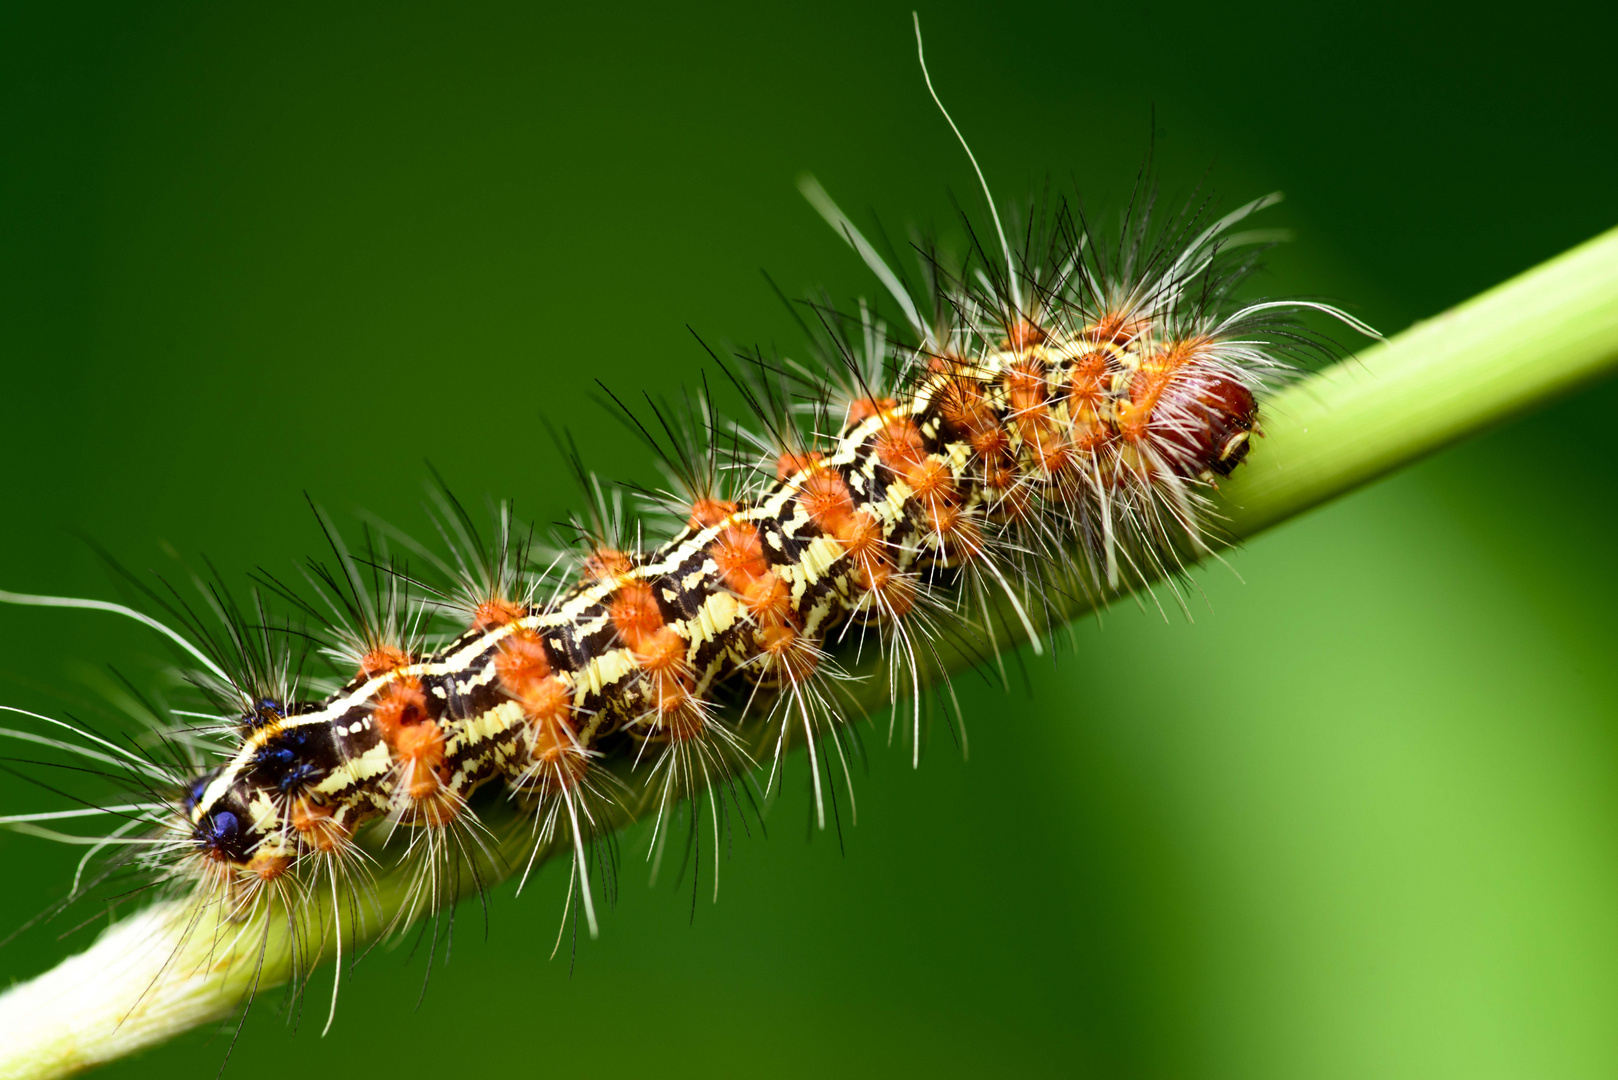 Caterpillar in Paraitepuy, Venezuela